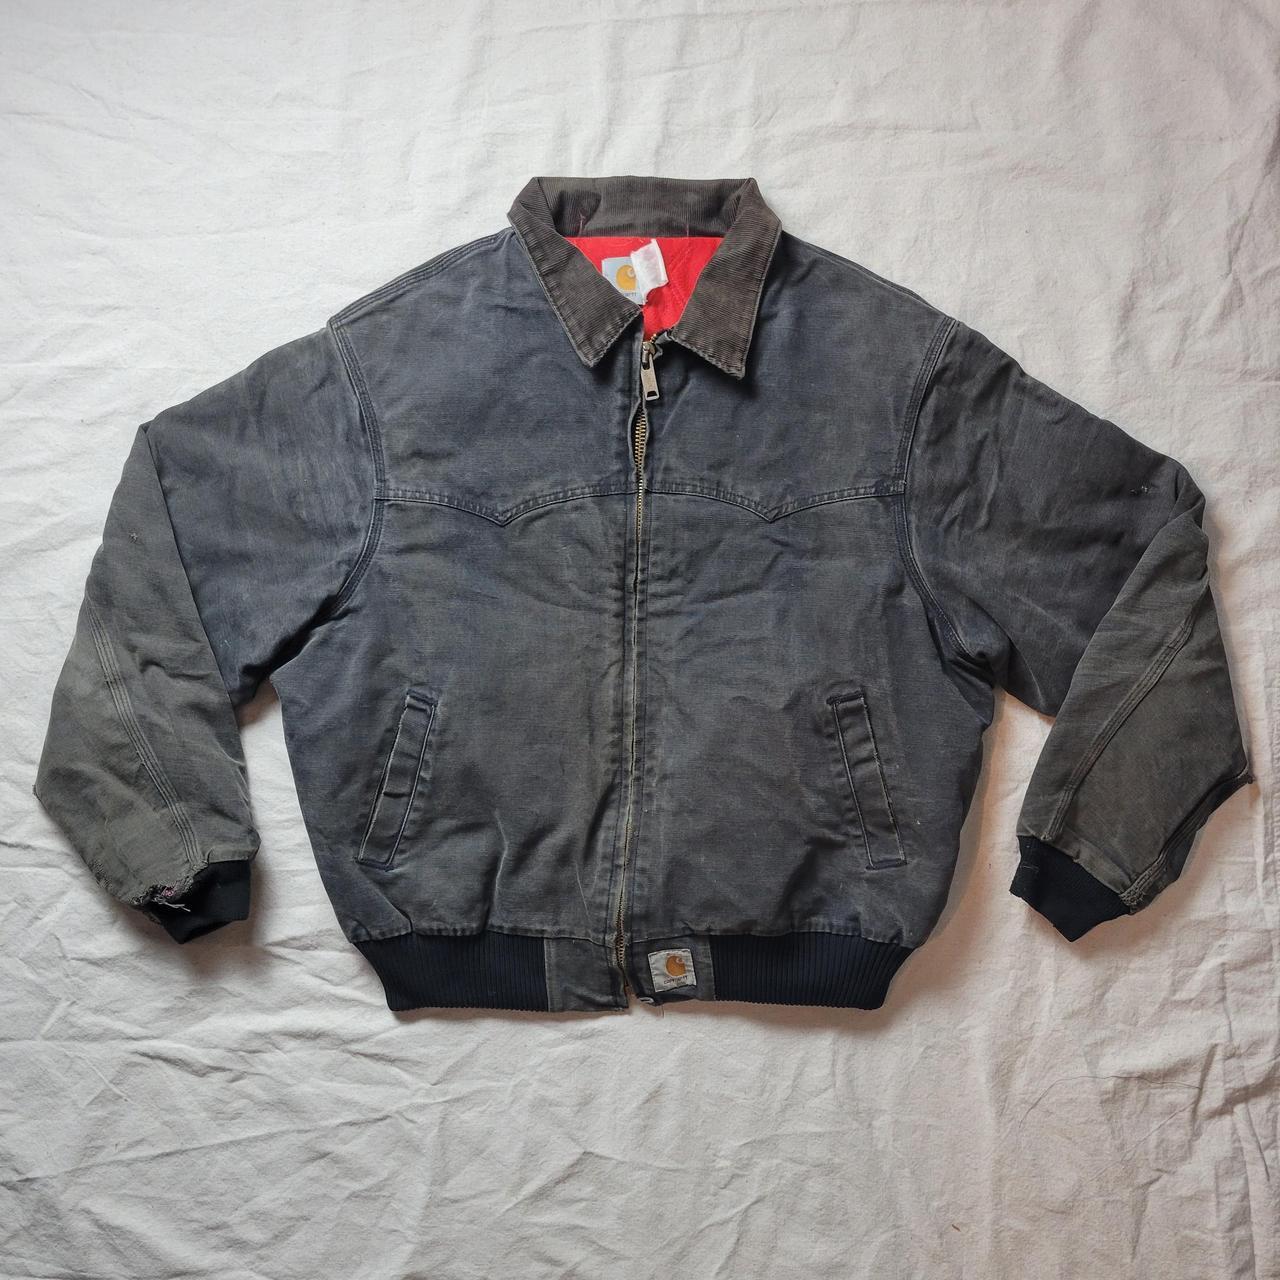 Product Image 1 - Vintage black / gray Carhartt